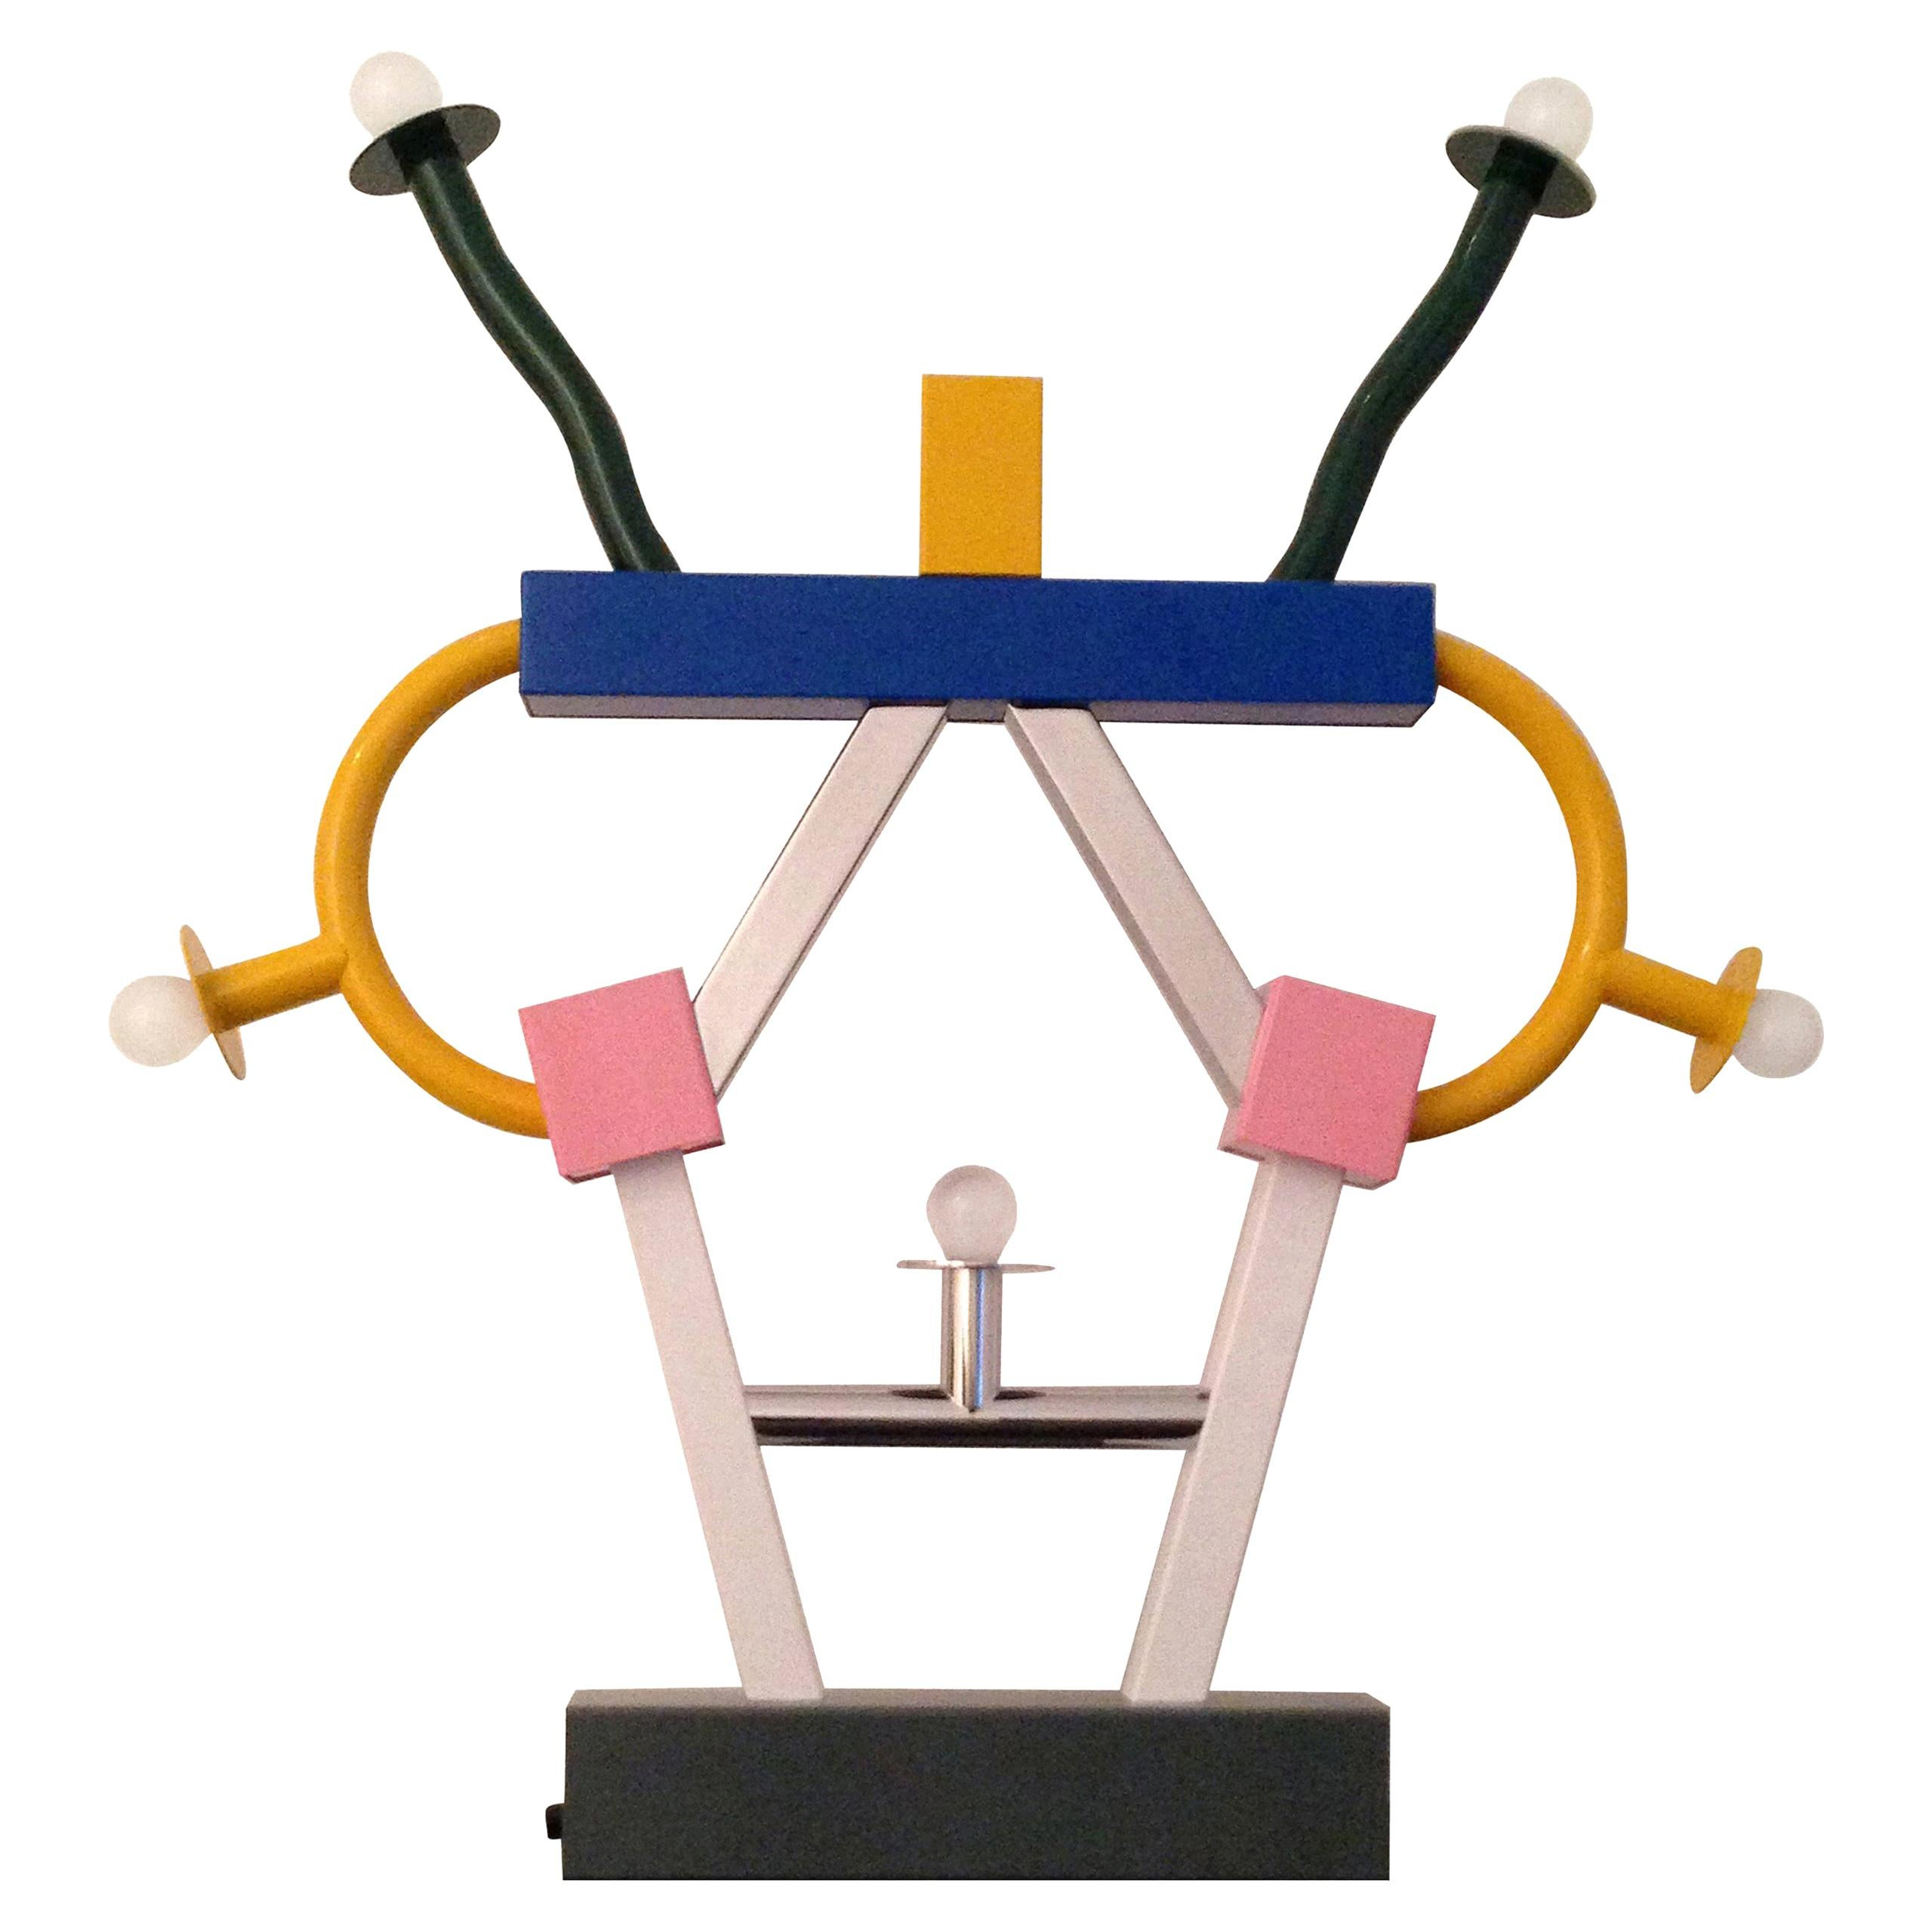 Ettore Sottsass ASHOKA Table Lamp for MEMPHIS srl